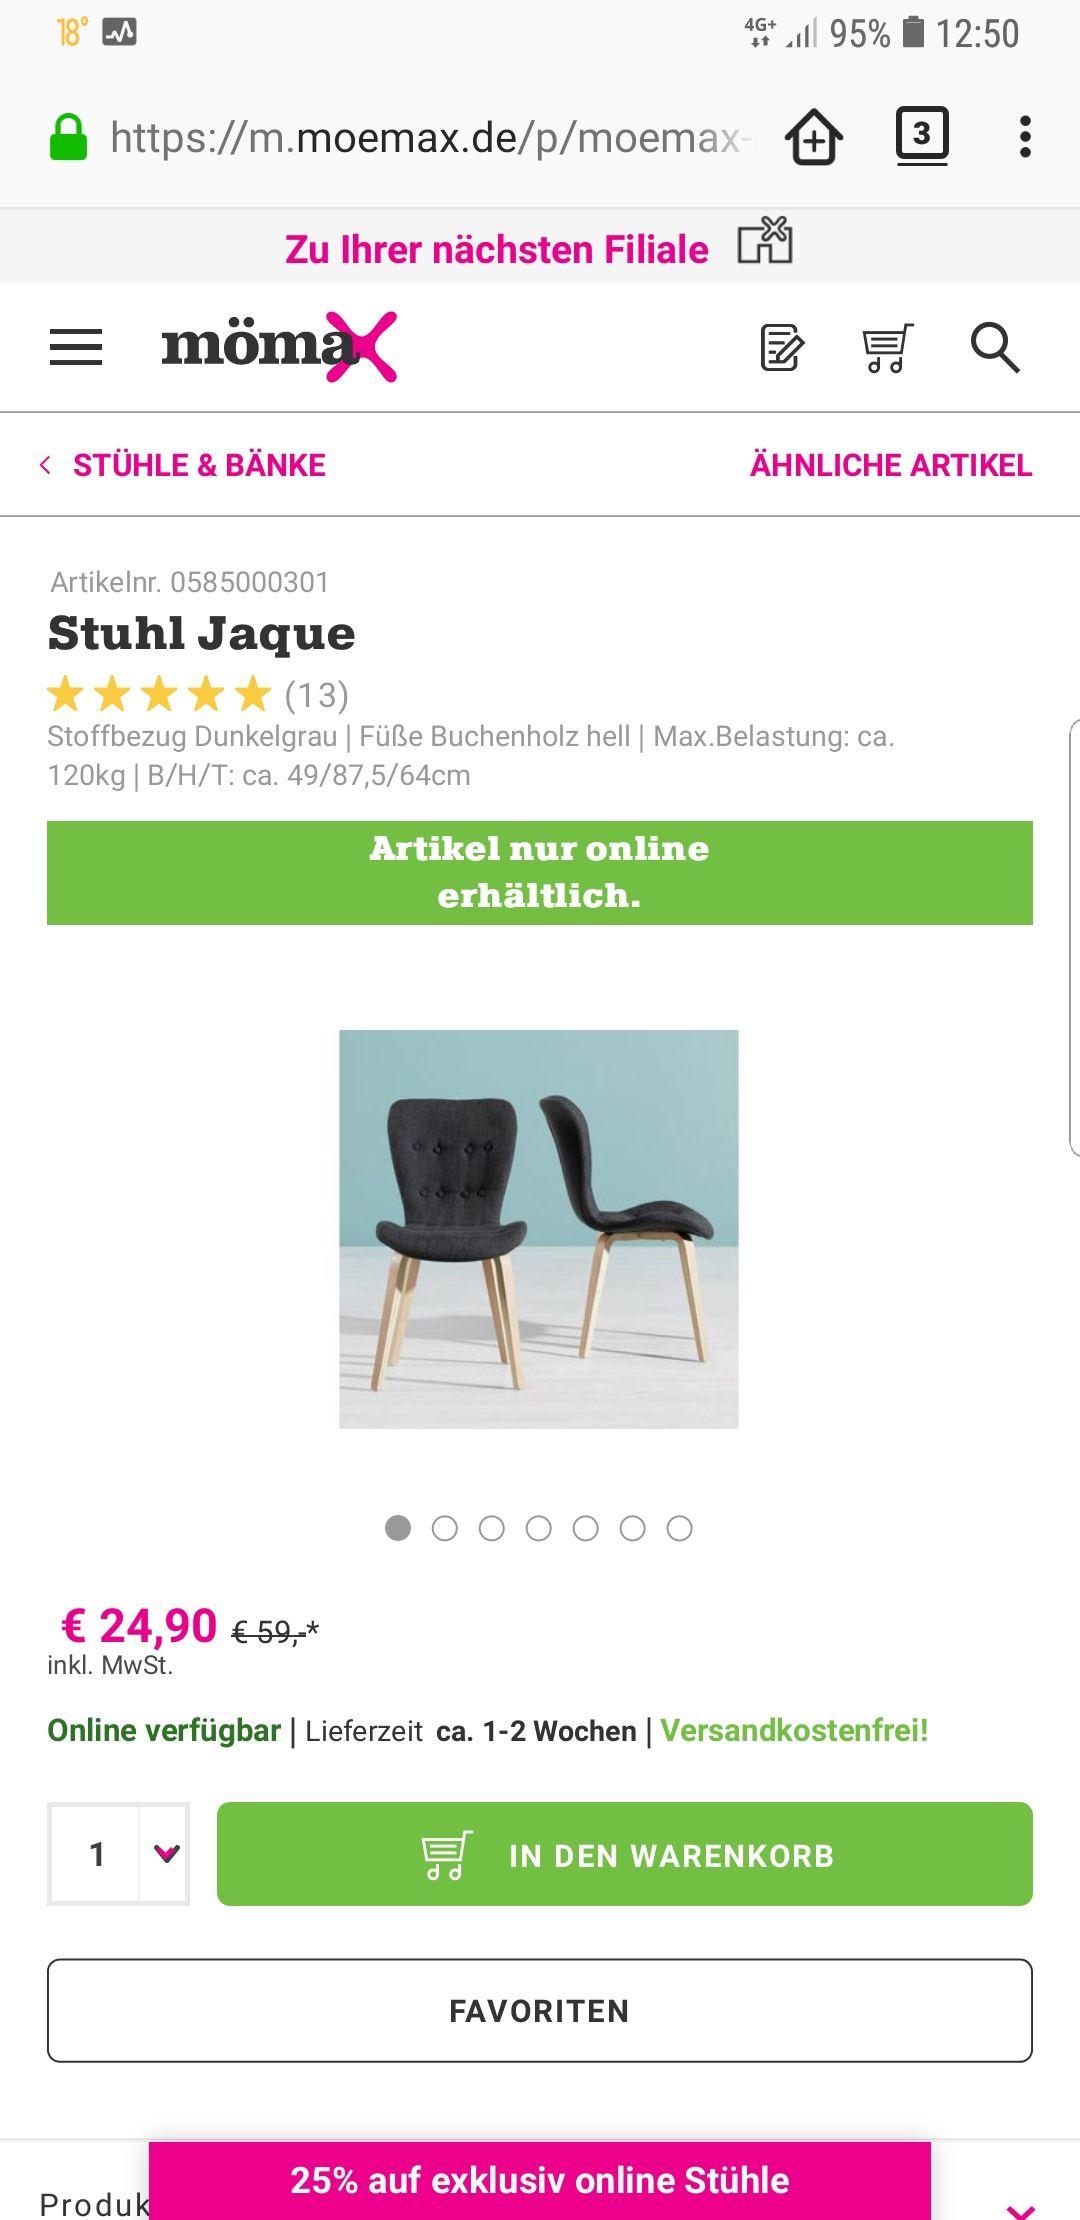 Stuhl JAQUE sowie alle anderen exclusiv online Stühle bei Mömax mömax.de mit 25% Rabatt